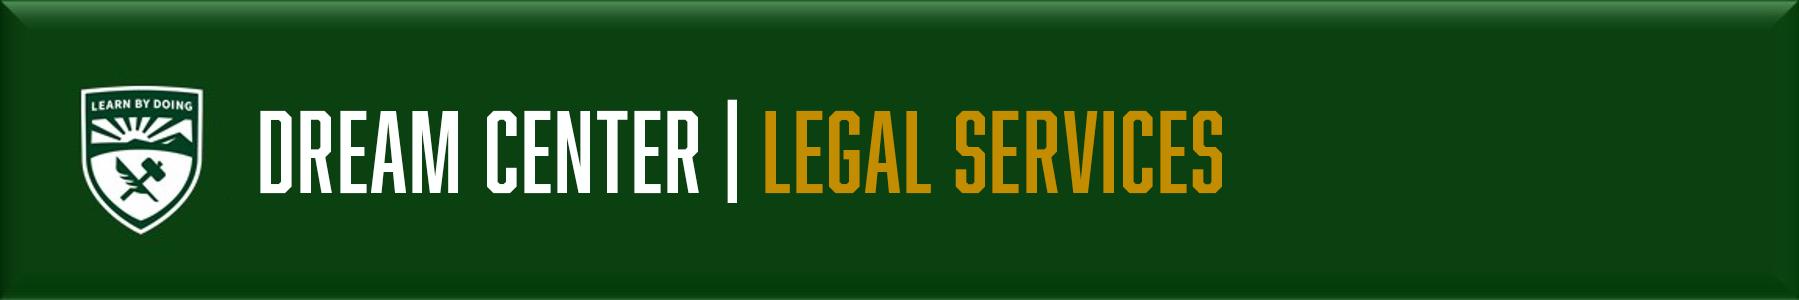 Dream Center - Legal Services